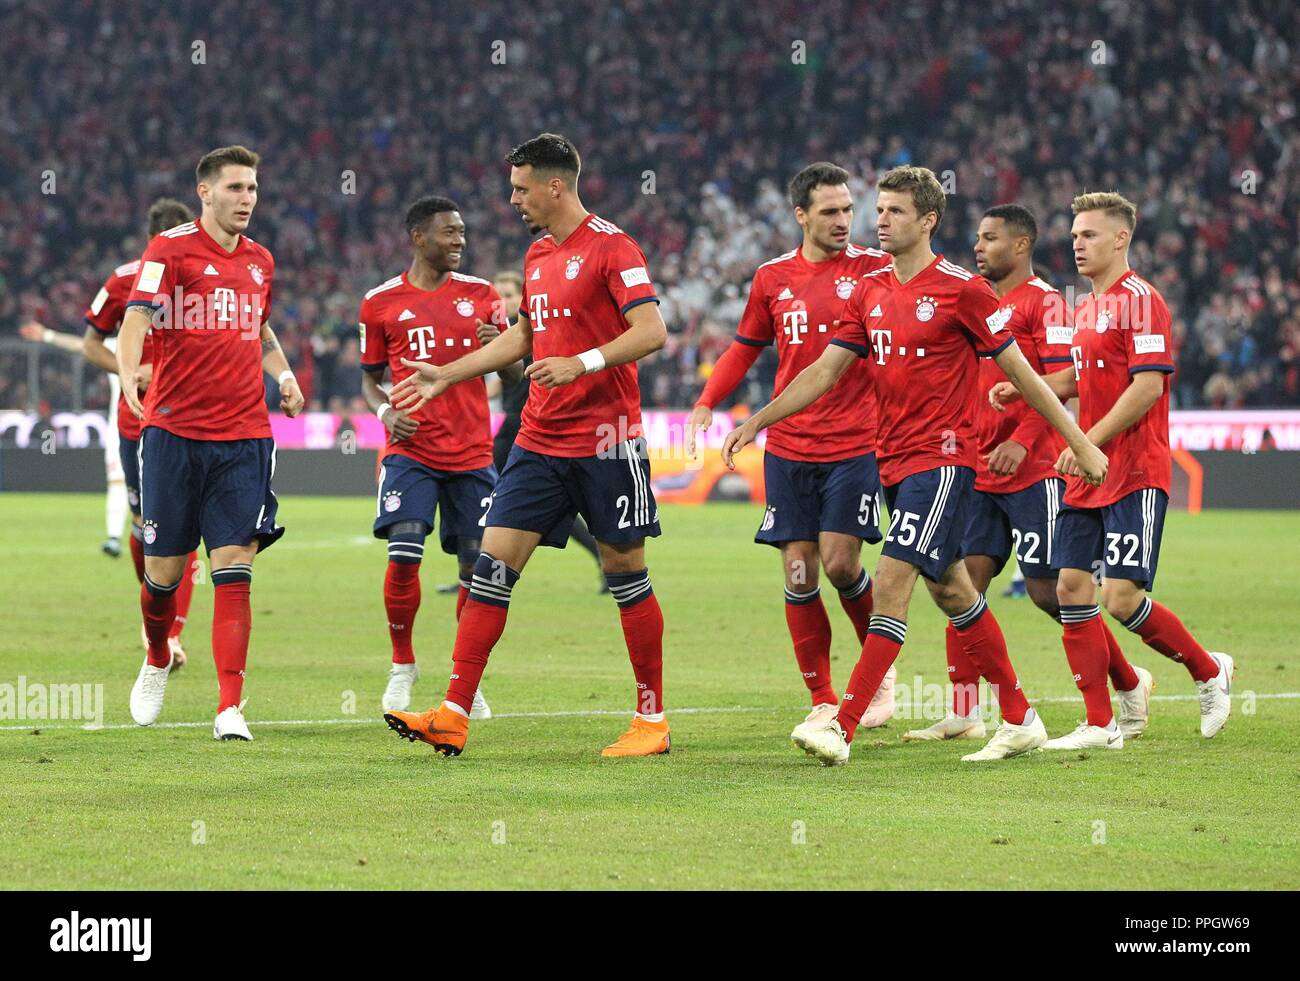 firo: 25.09.2018 Fuvuball, Football: 1.Bundesliga FC Bayern Munich - FC Augsburg, FC Bayern, Munich, Munich, jubilation, whole figures | usage worldwide Stock Photo